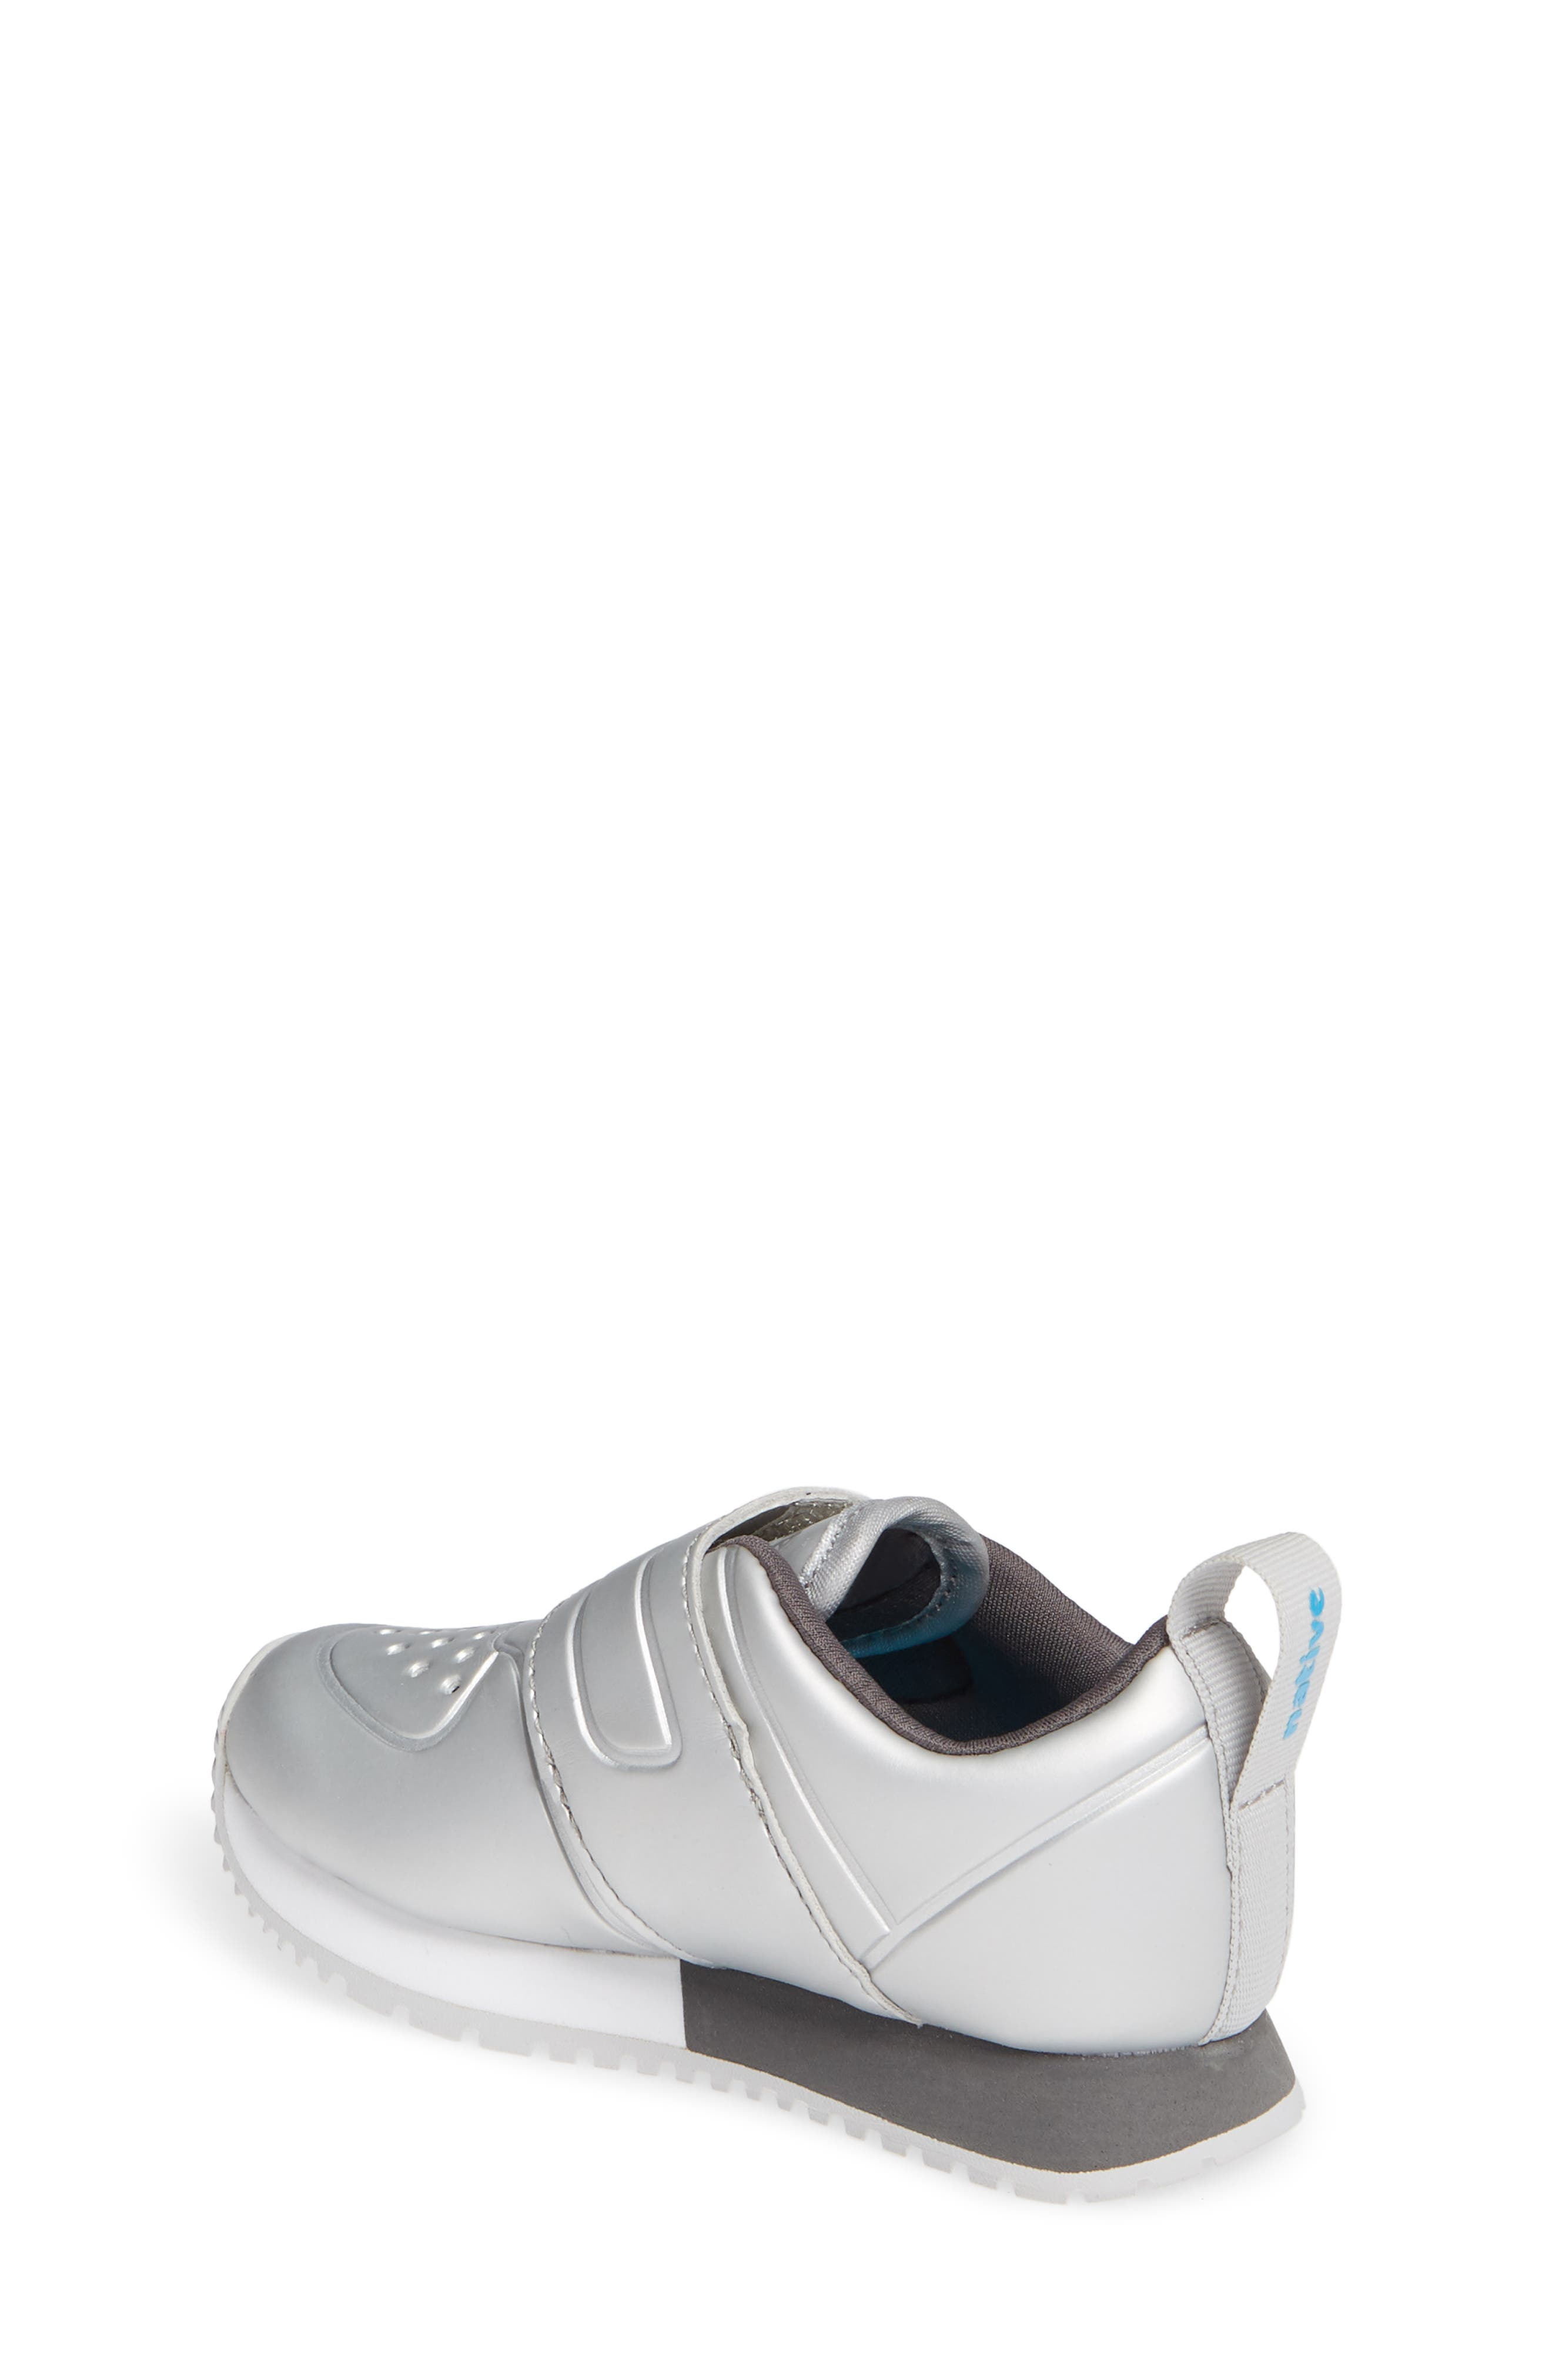 Cornell Perforated Metallic Sneaker,                             Alternate thumbnail 2, color,                             SILVER/ WHITE/ DUBLIN GREY